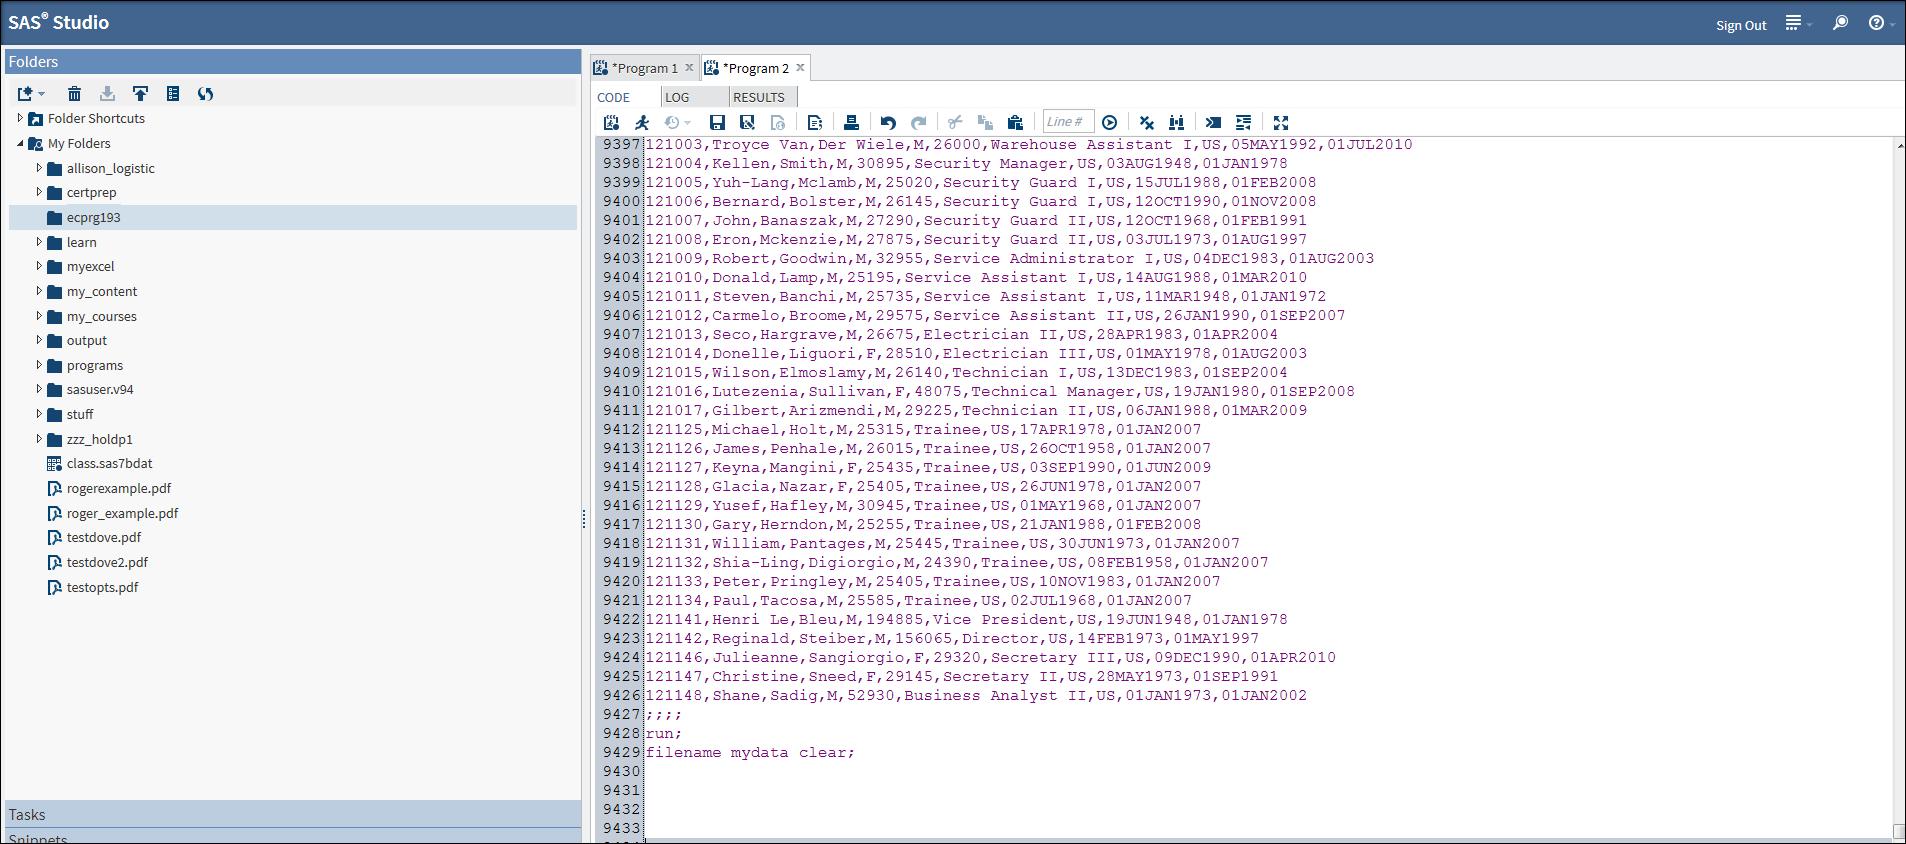 3b_paste_code_into_SAS_Studio_window.png